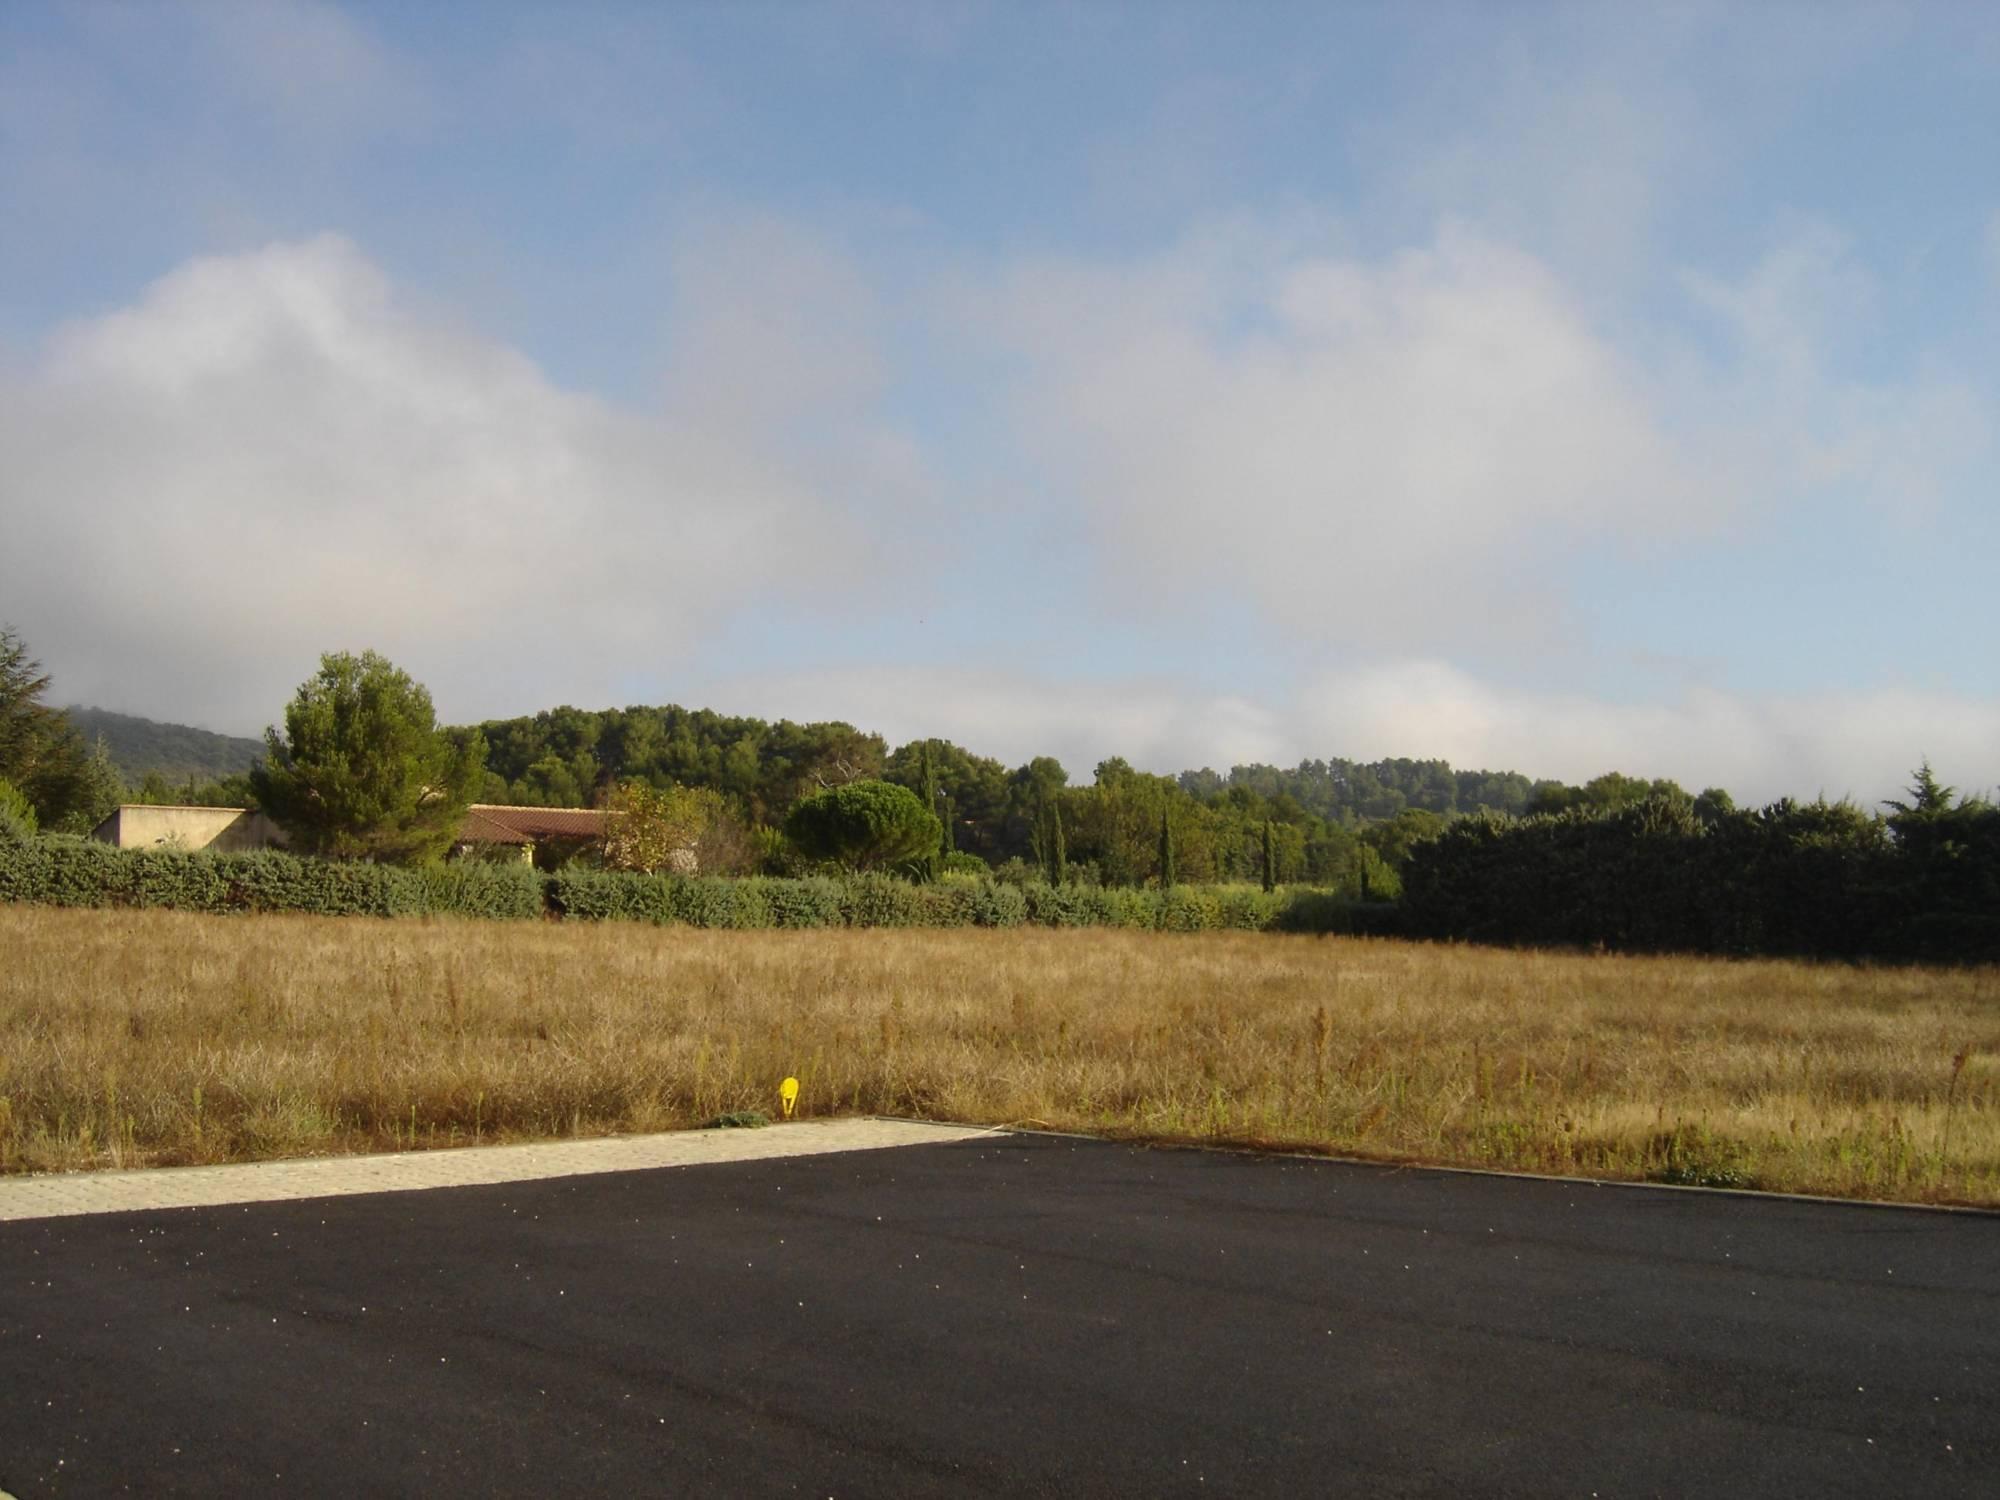 Lourmarin 84160 terrain vendre constructible 4 parcelles disponibles azur logement proven al - Terrain a vendre salon de provence ...